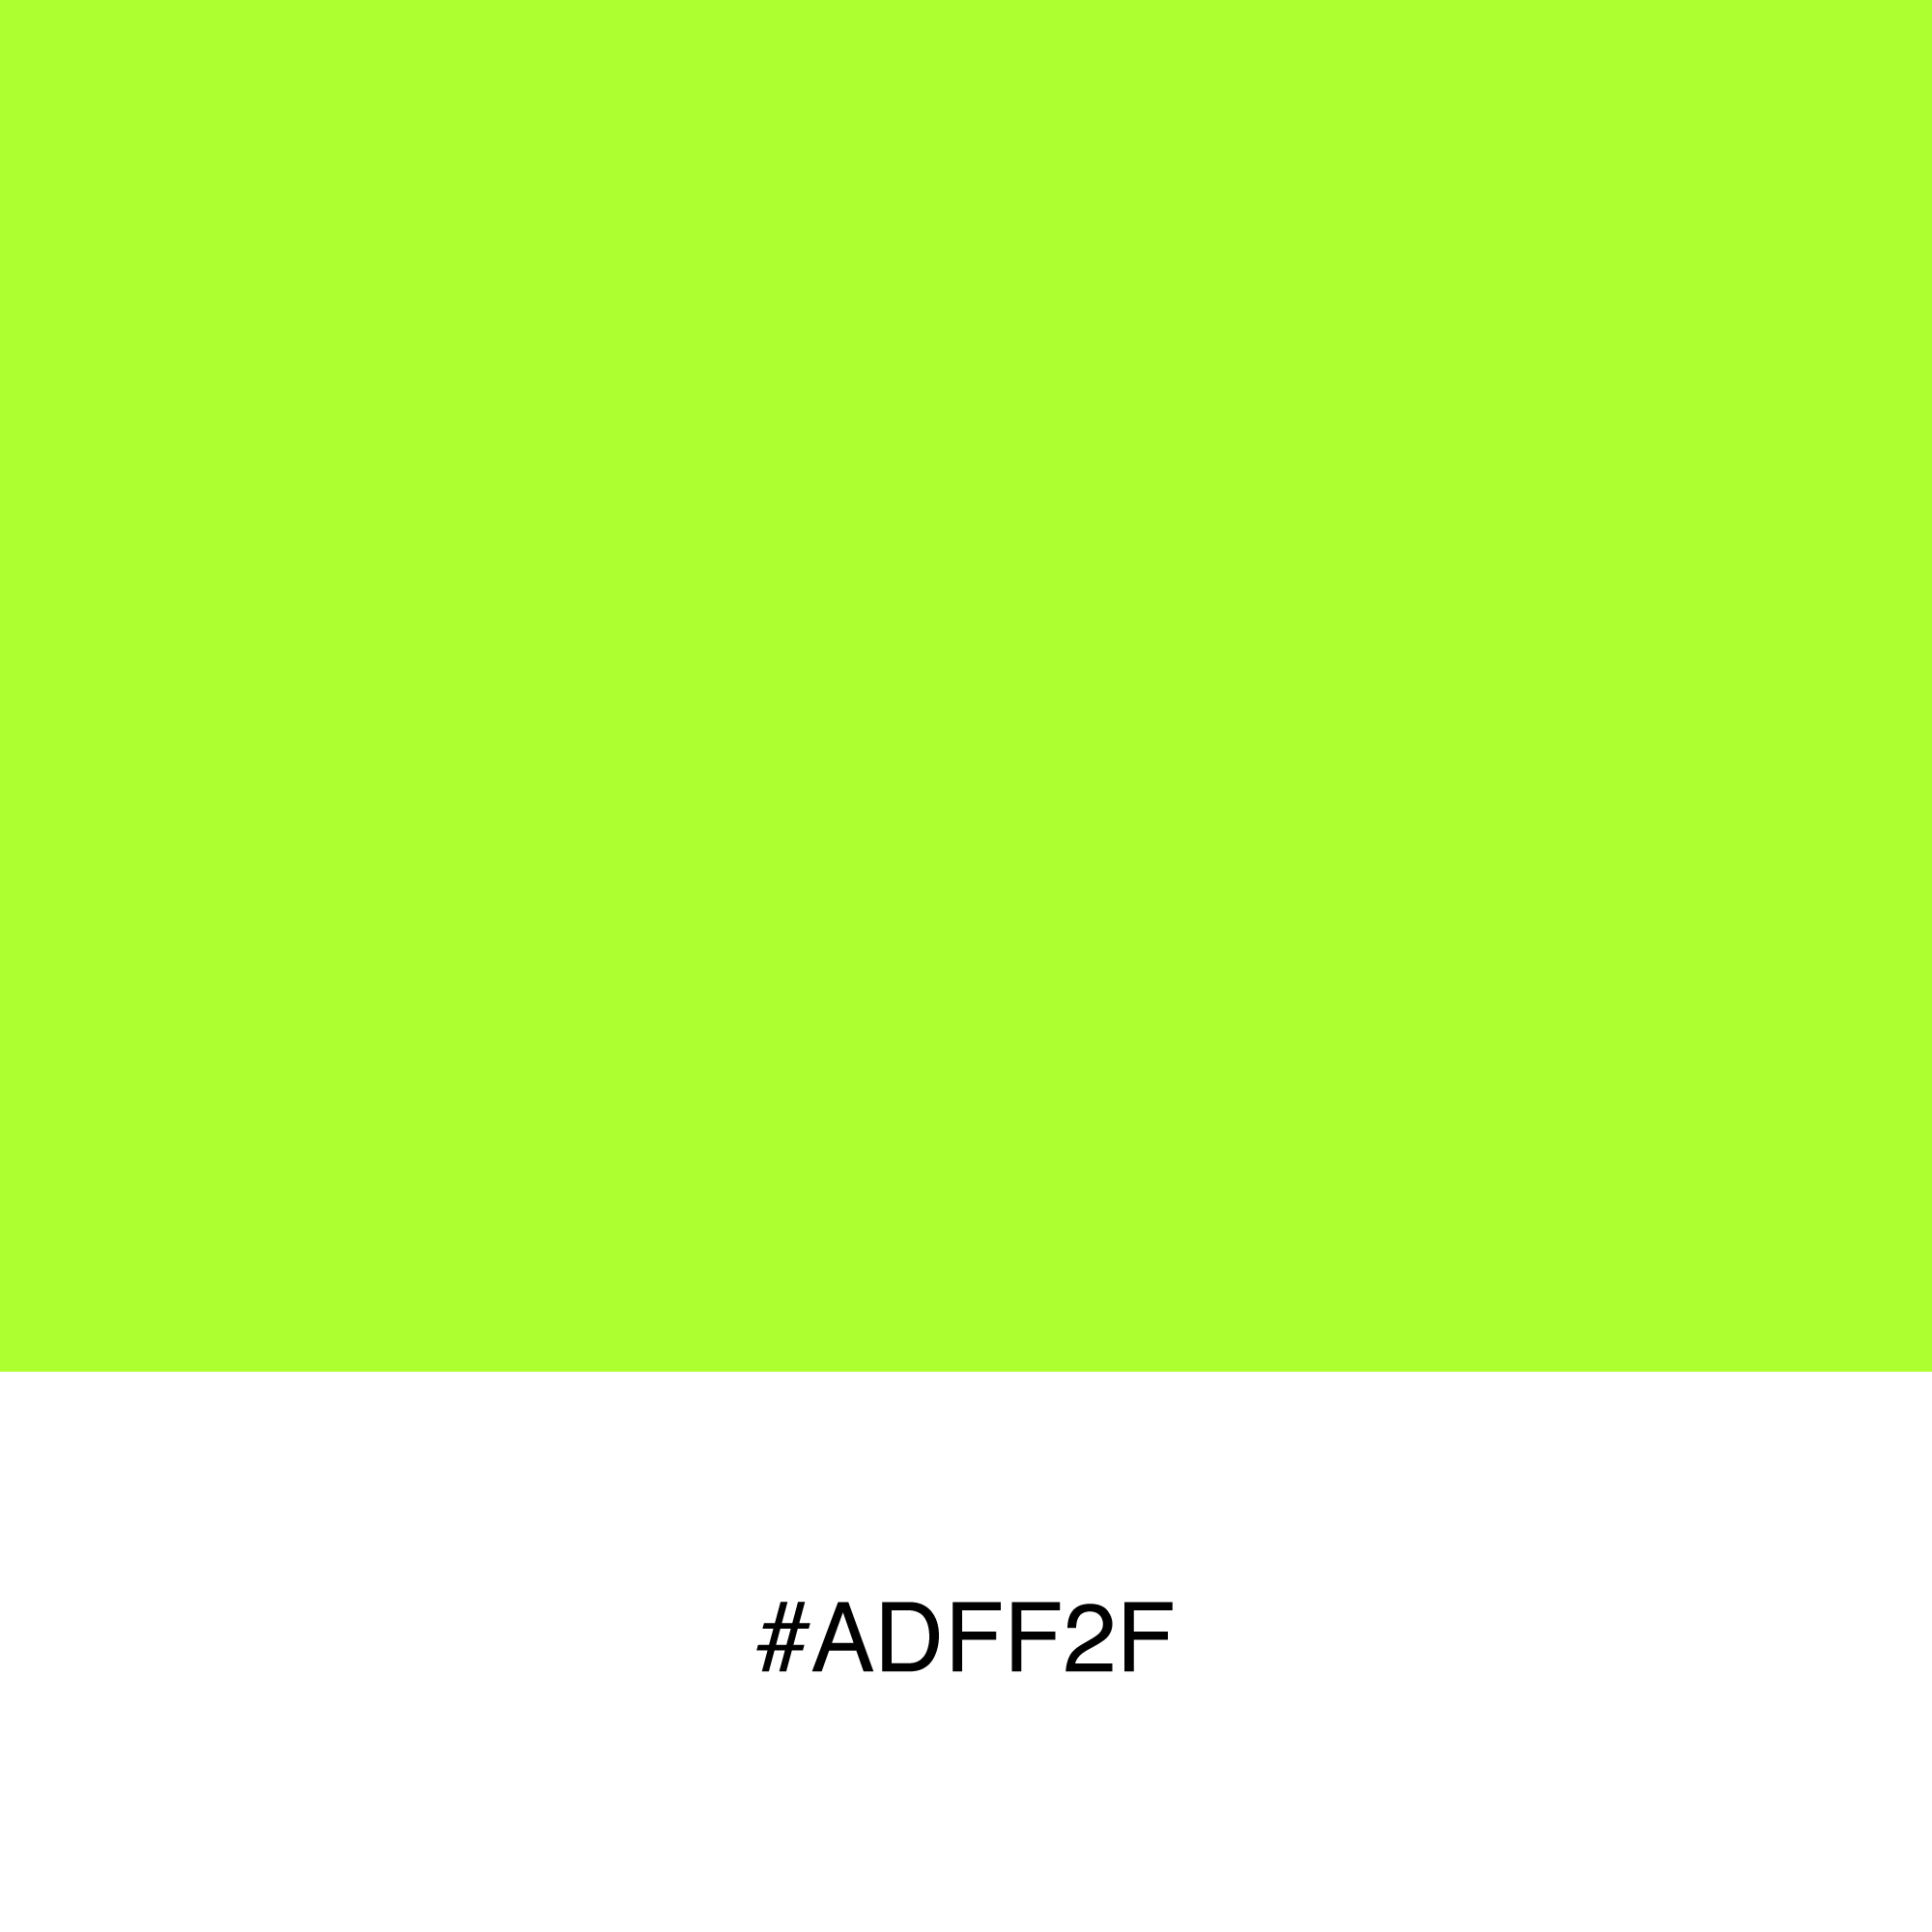 color-swatch-adff2f